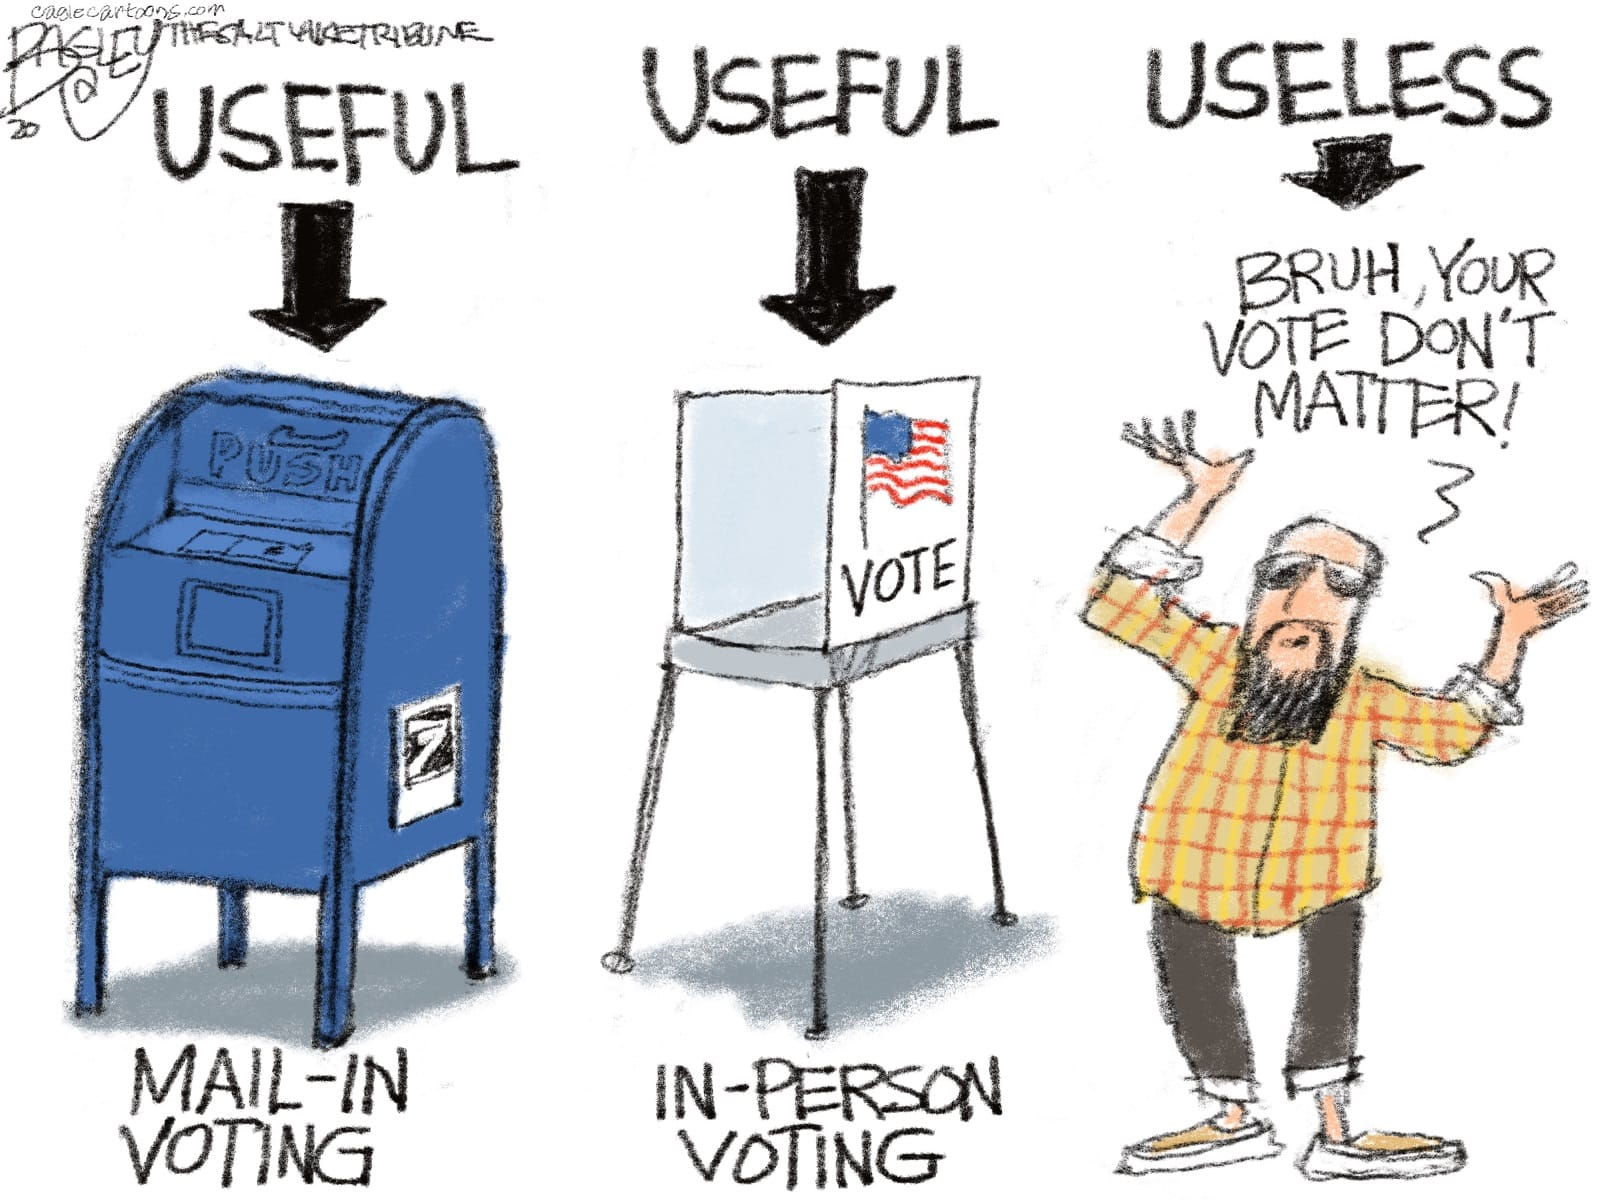 Sept. 26: Voting Bug